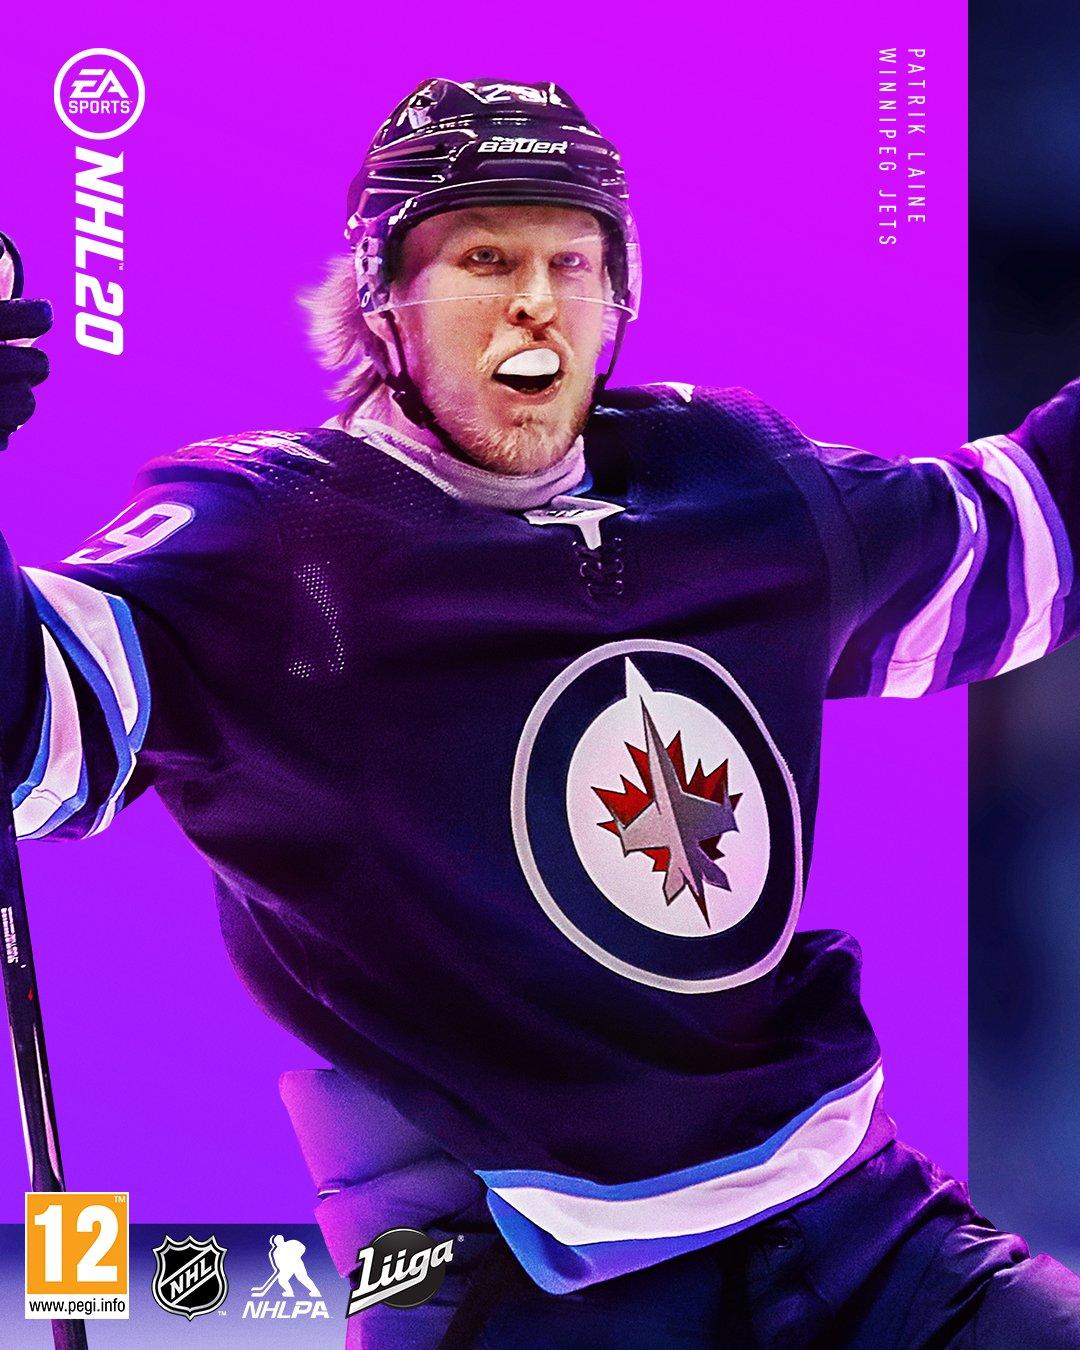 The NHL 20 Finland cover art depicting Patrik Laine.